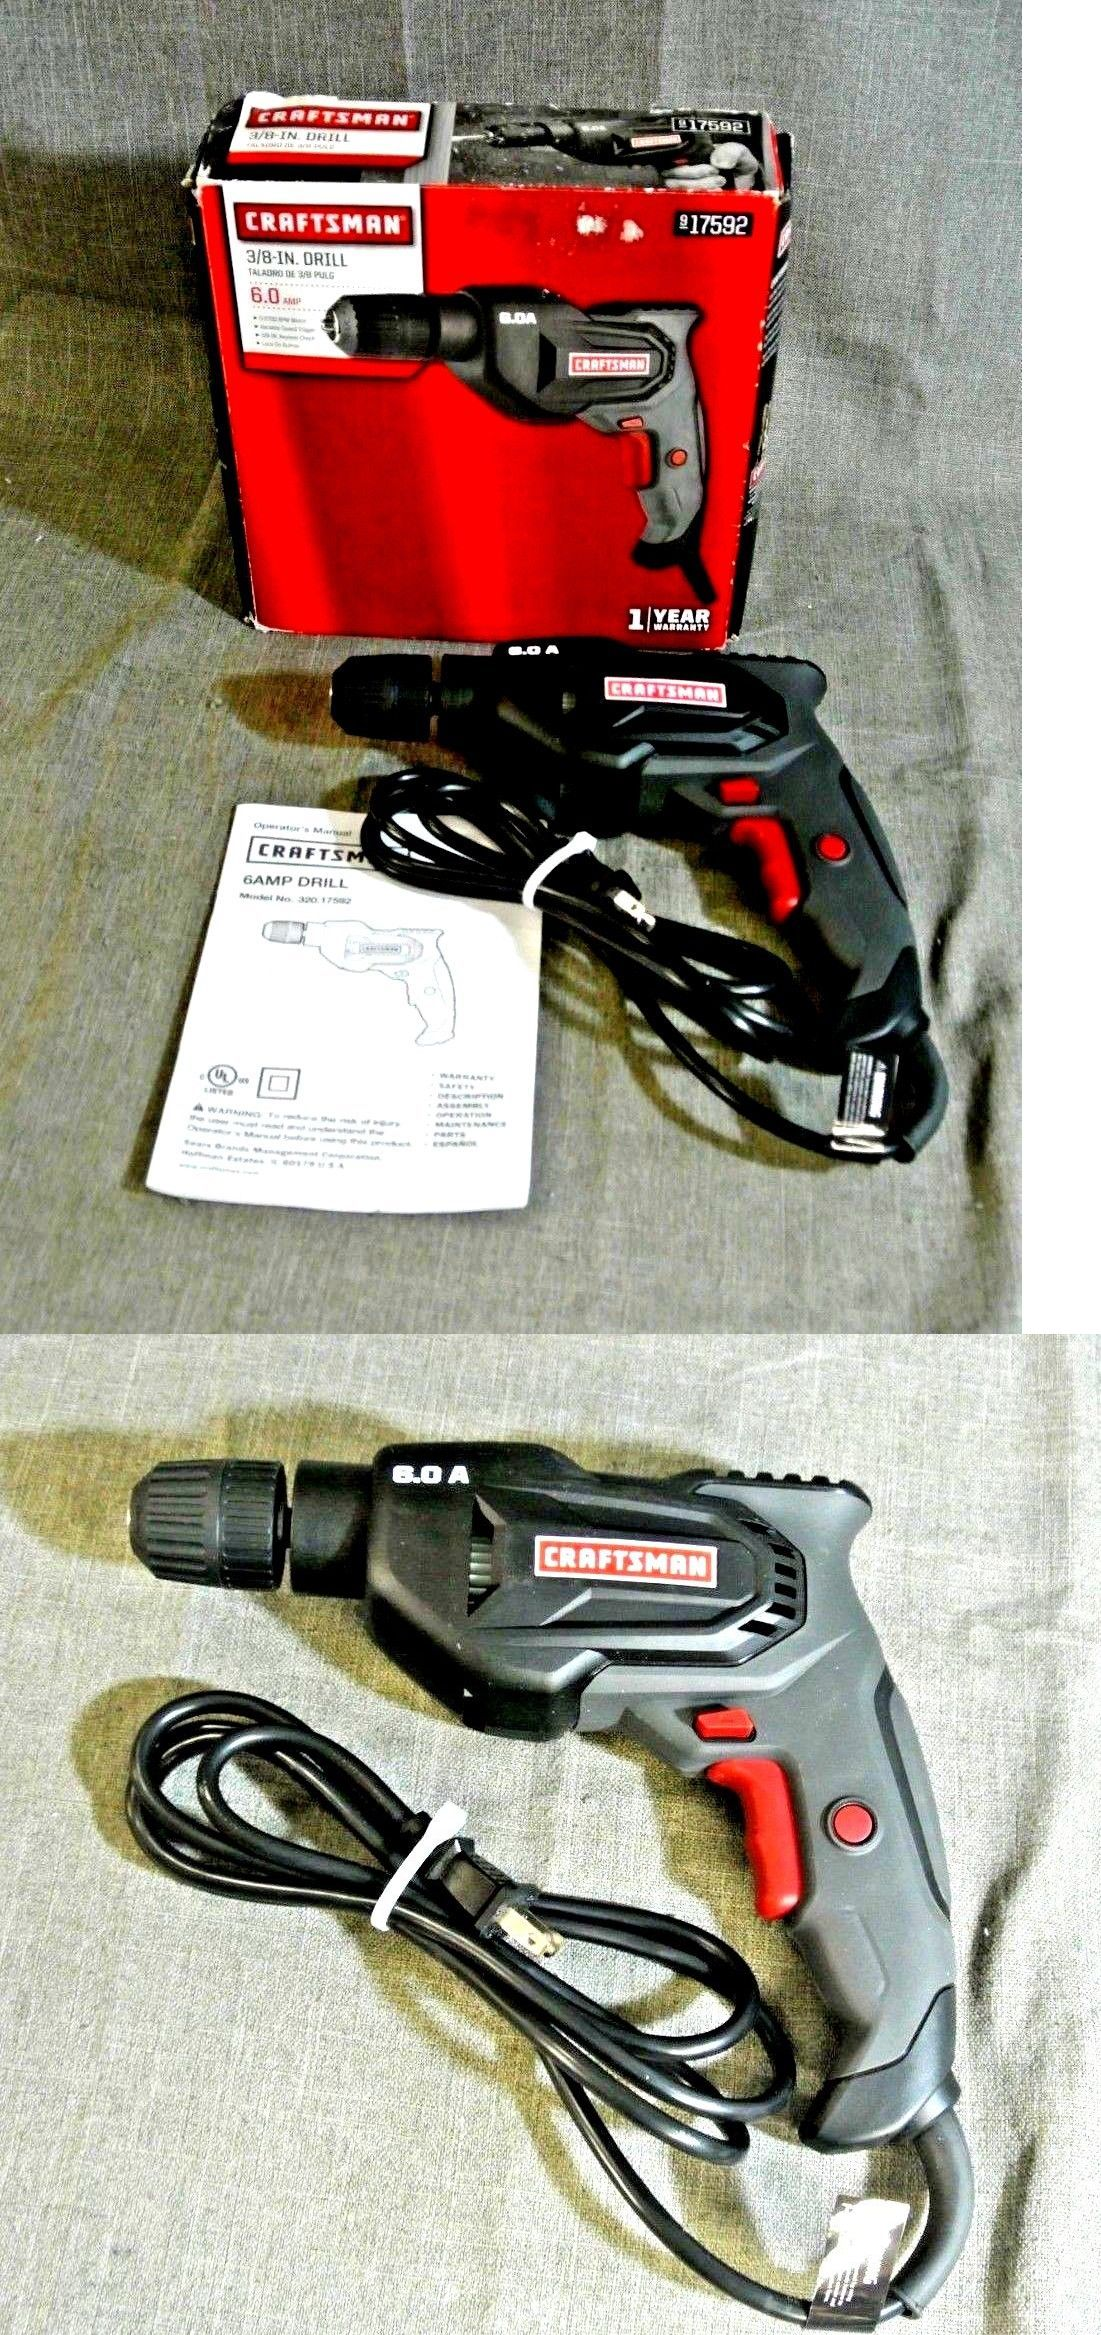 Corded Drills 184654: Craftsman 17592 3 8 6 Amp Corded Drill